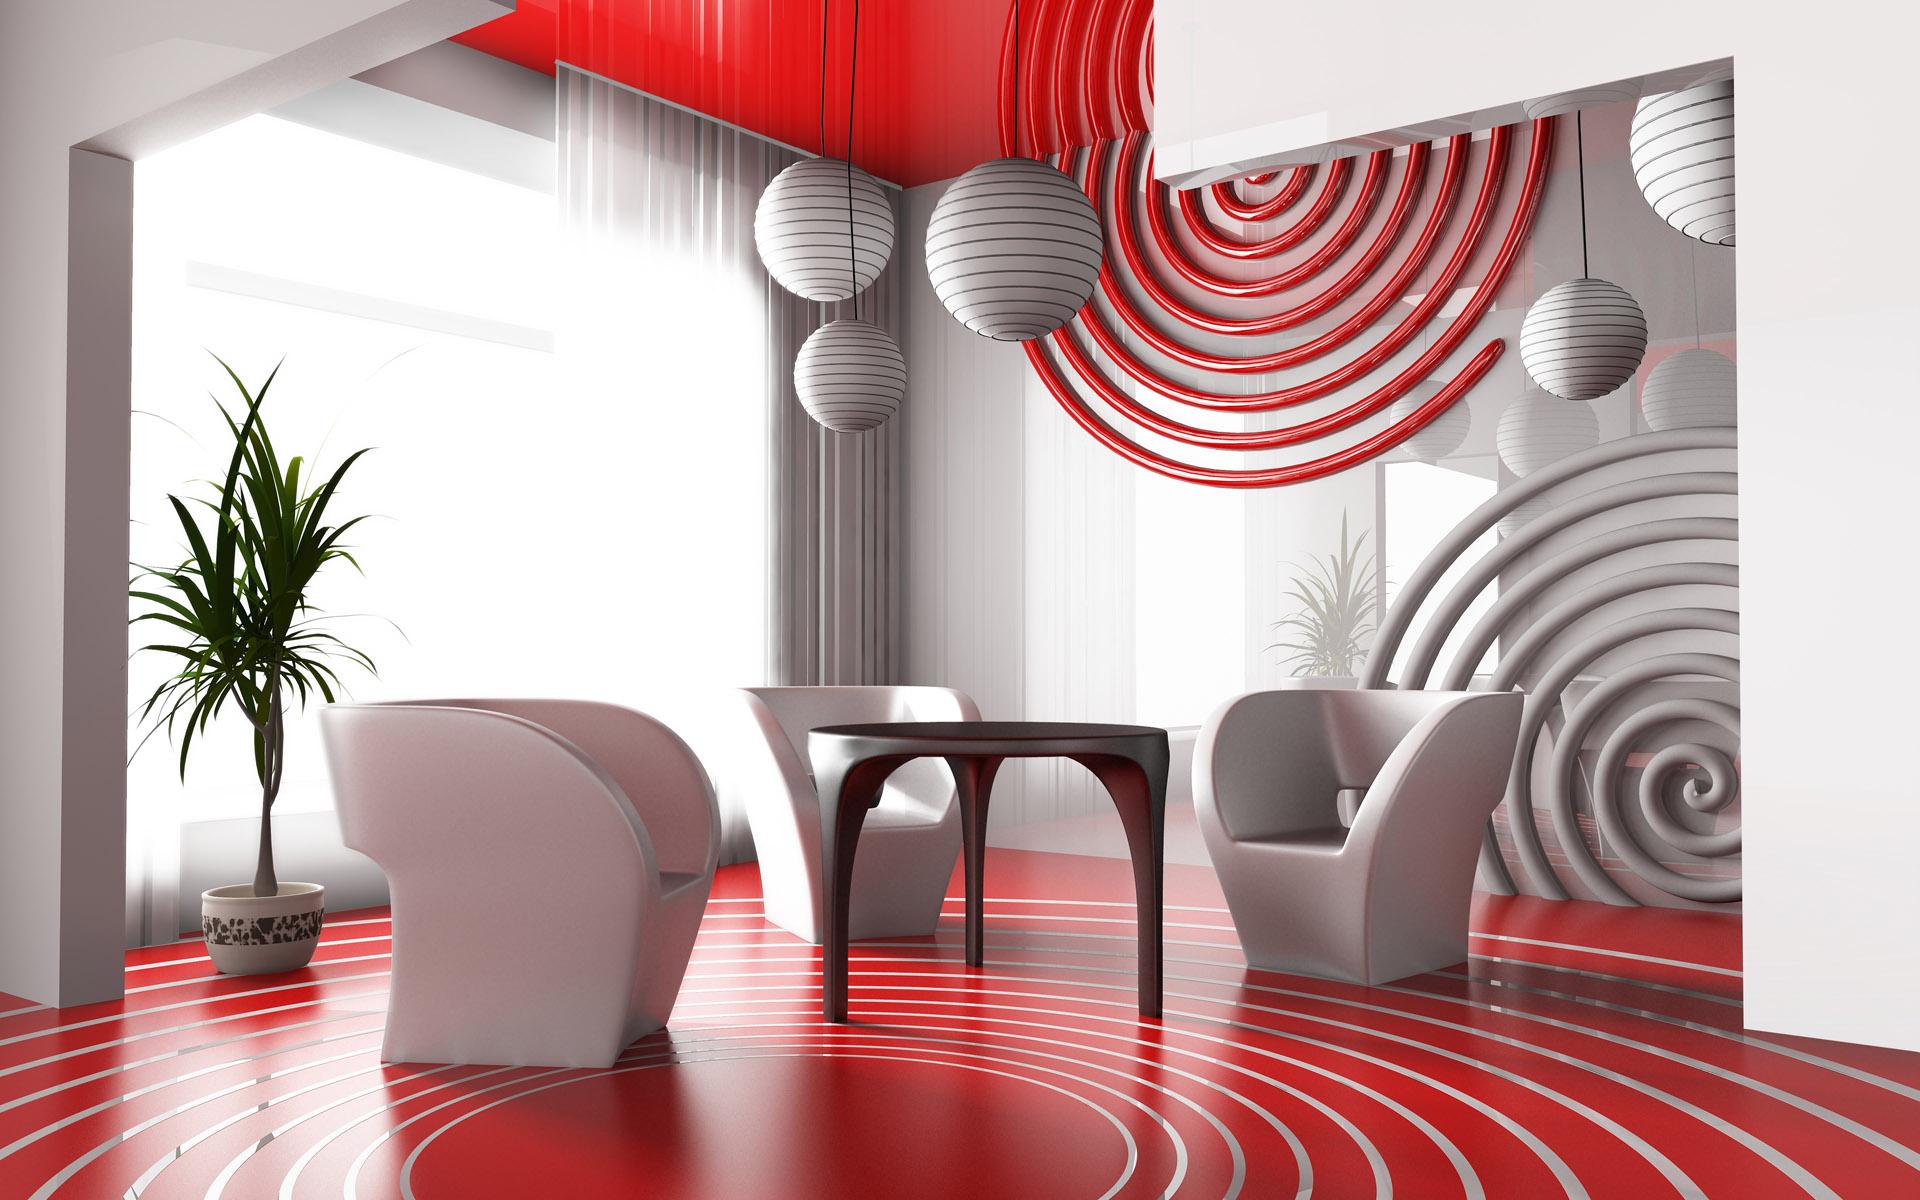 drwaing-room-ideas3 drwaing room ideas